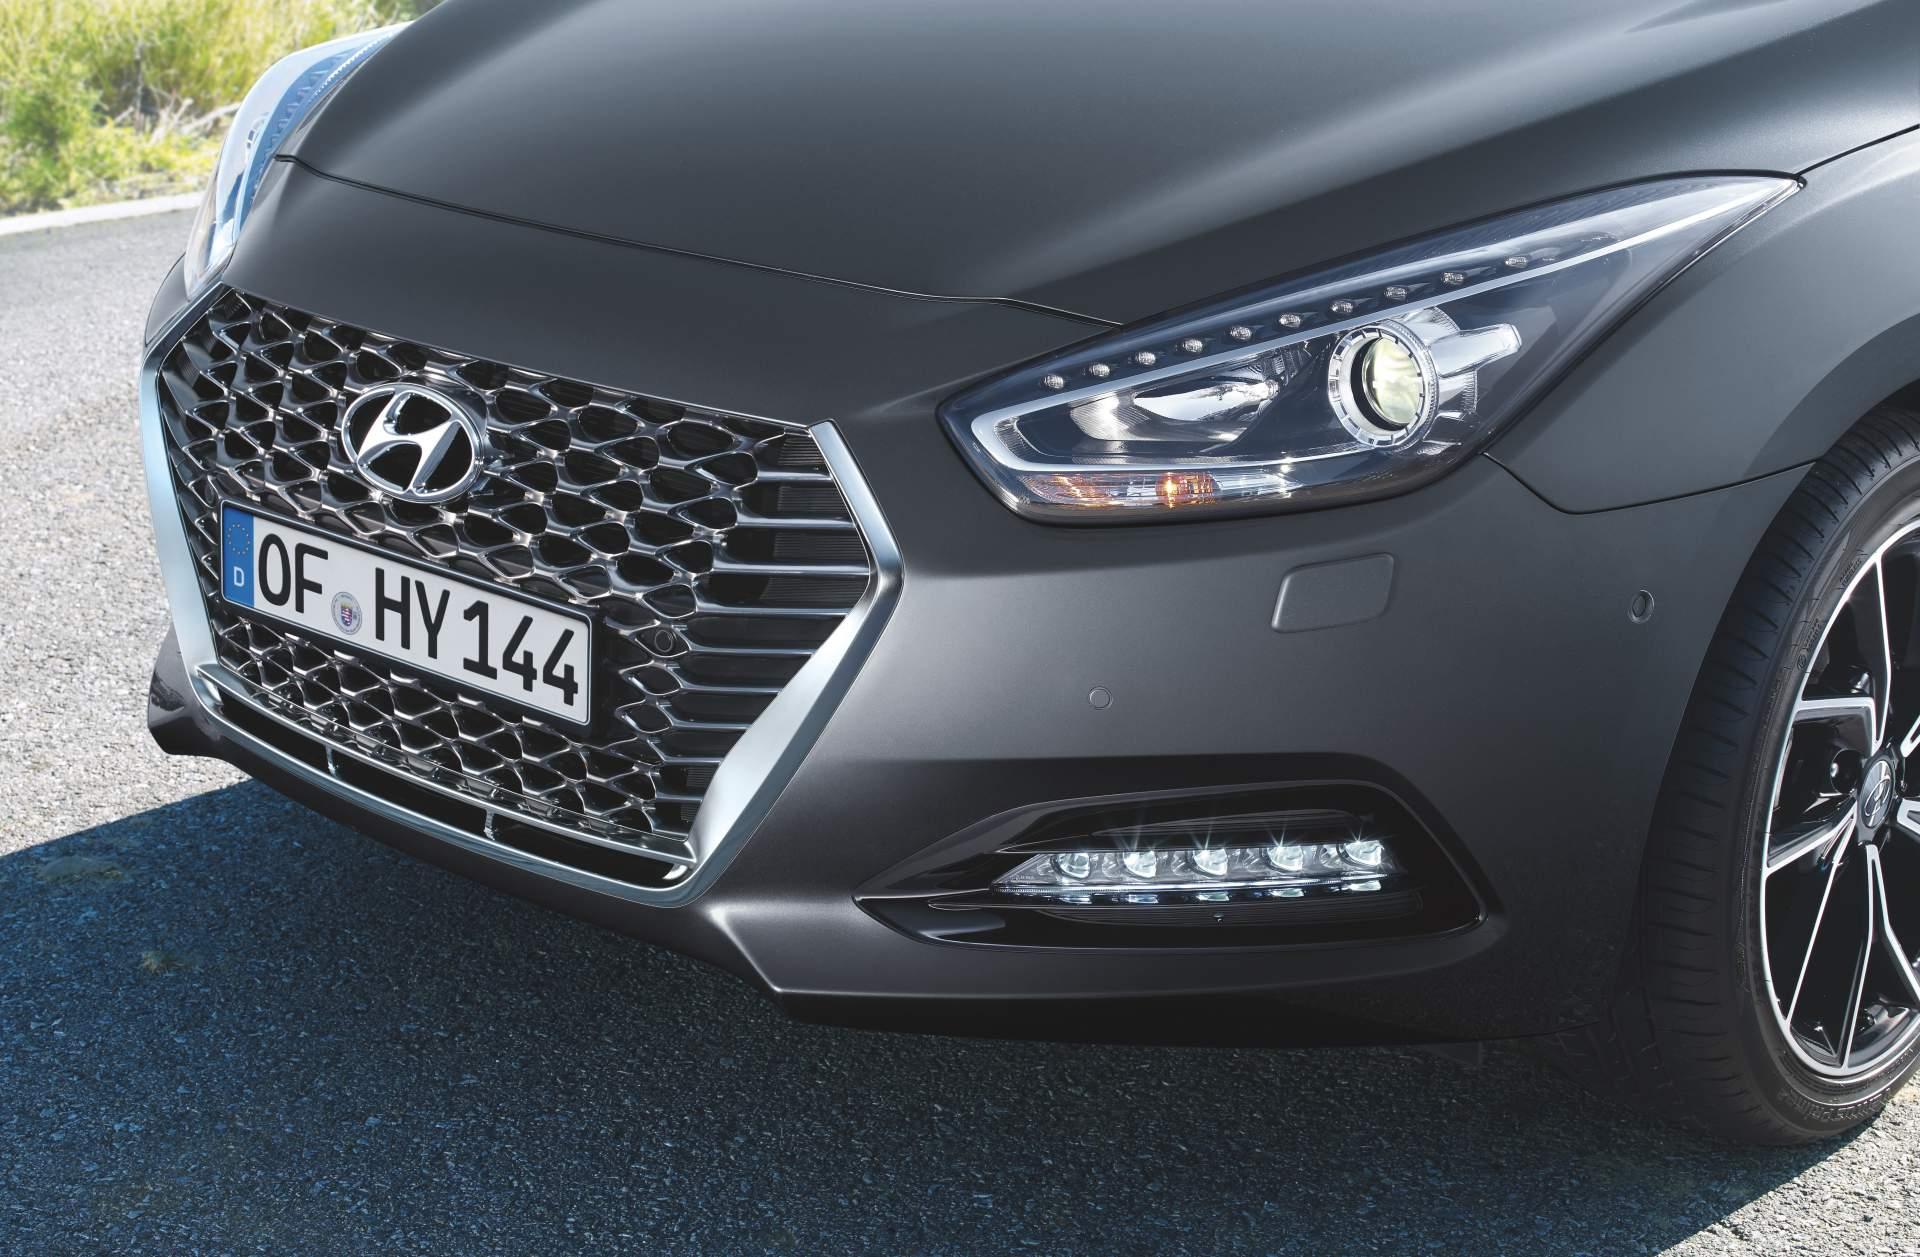 2019_Hyundai_i40_facelift–05